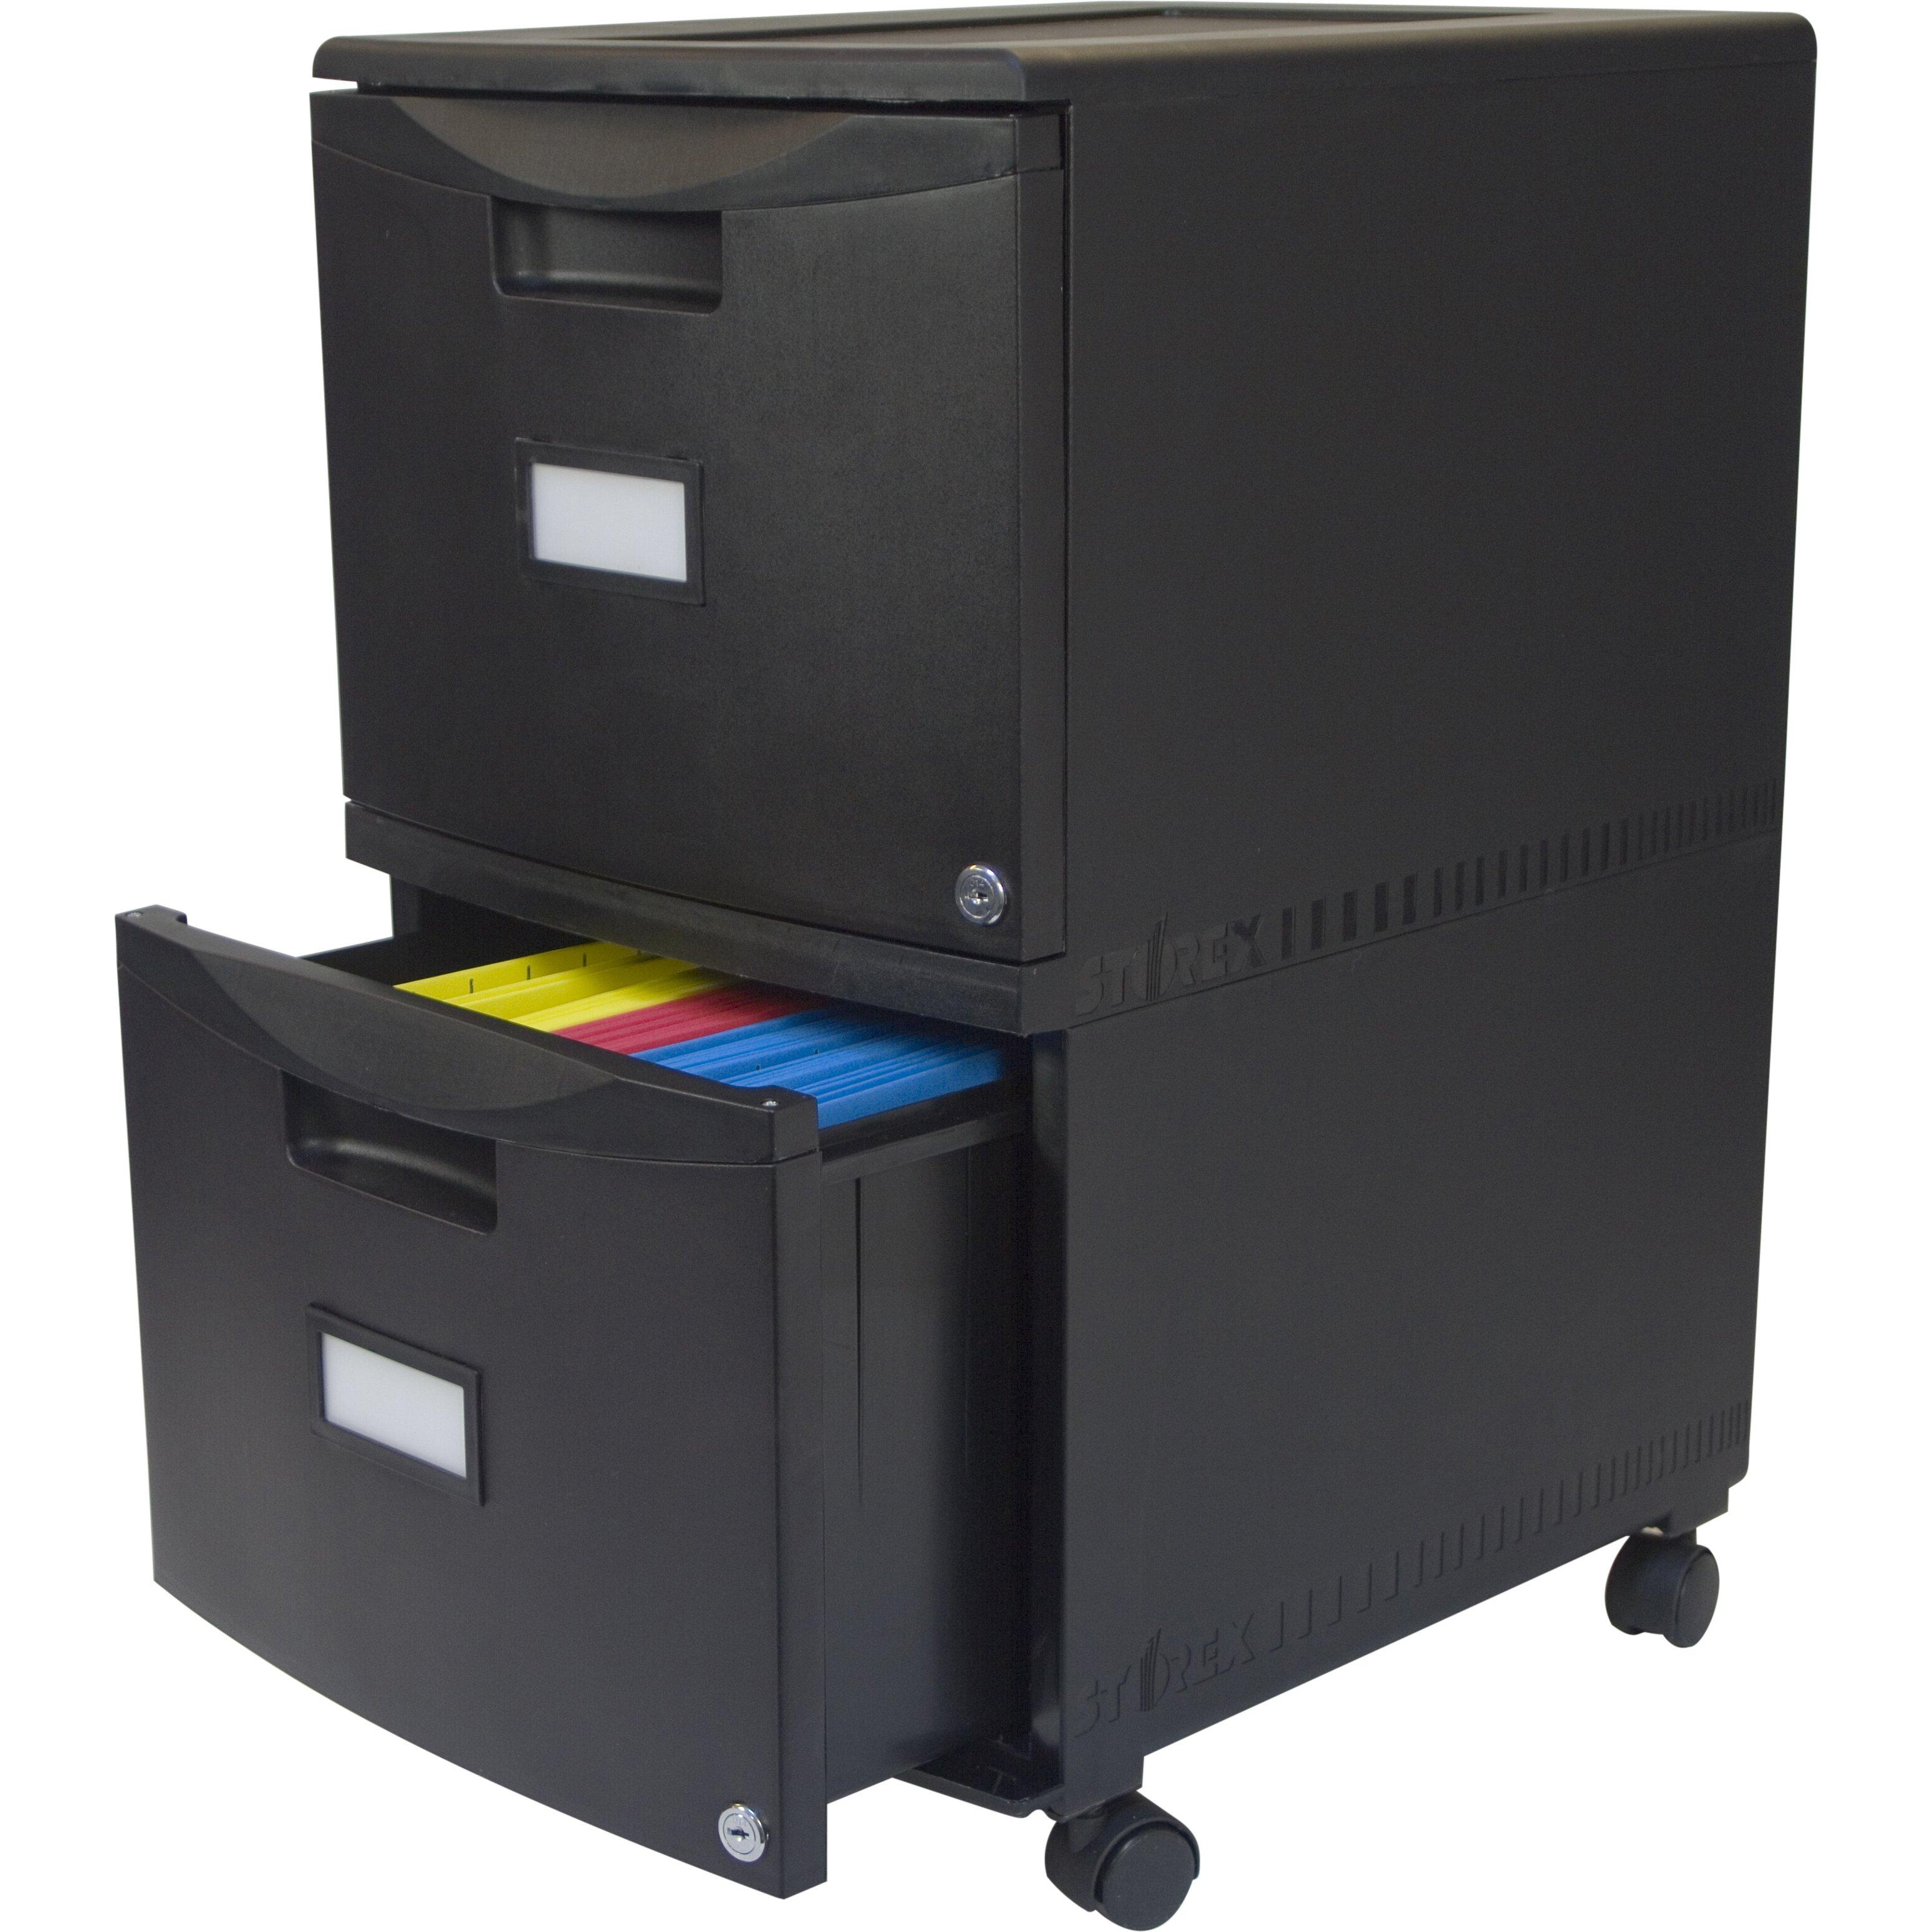 storex 2 drawer mobile file cabinet with lock reviews wayfair supply. Black Bedroom Furniture Sets. Home Design Ideas